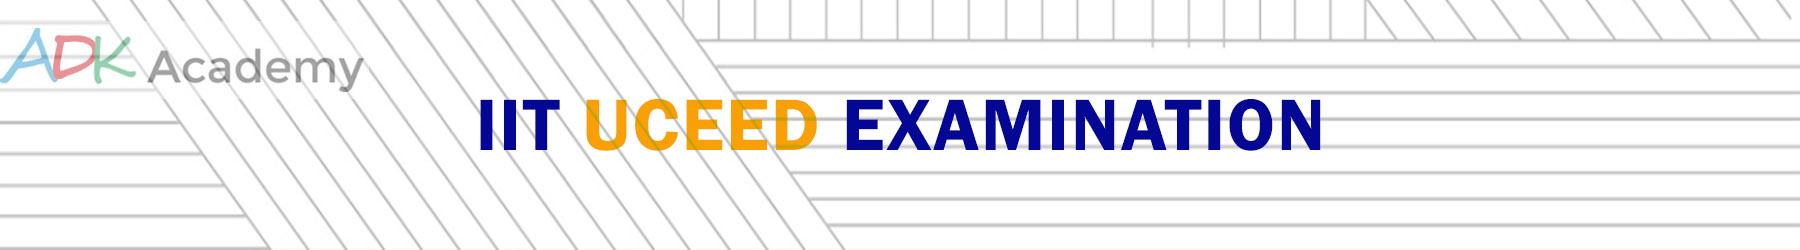 iit uceed ceed design exam preparation